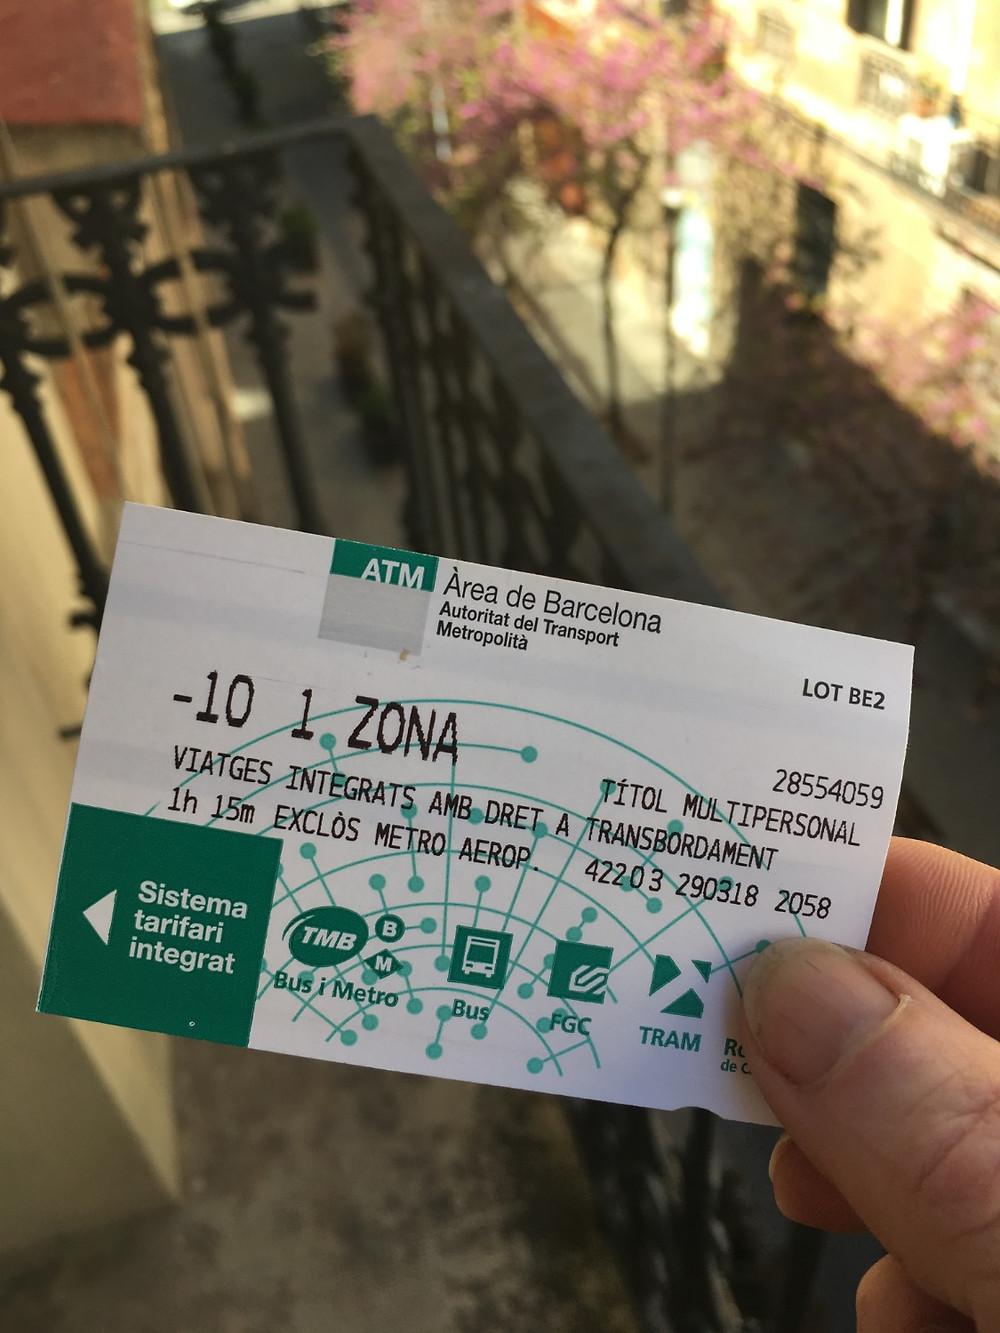 T-10 transport ticket for Barcelona